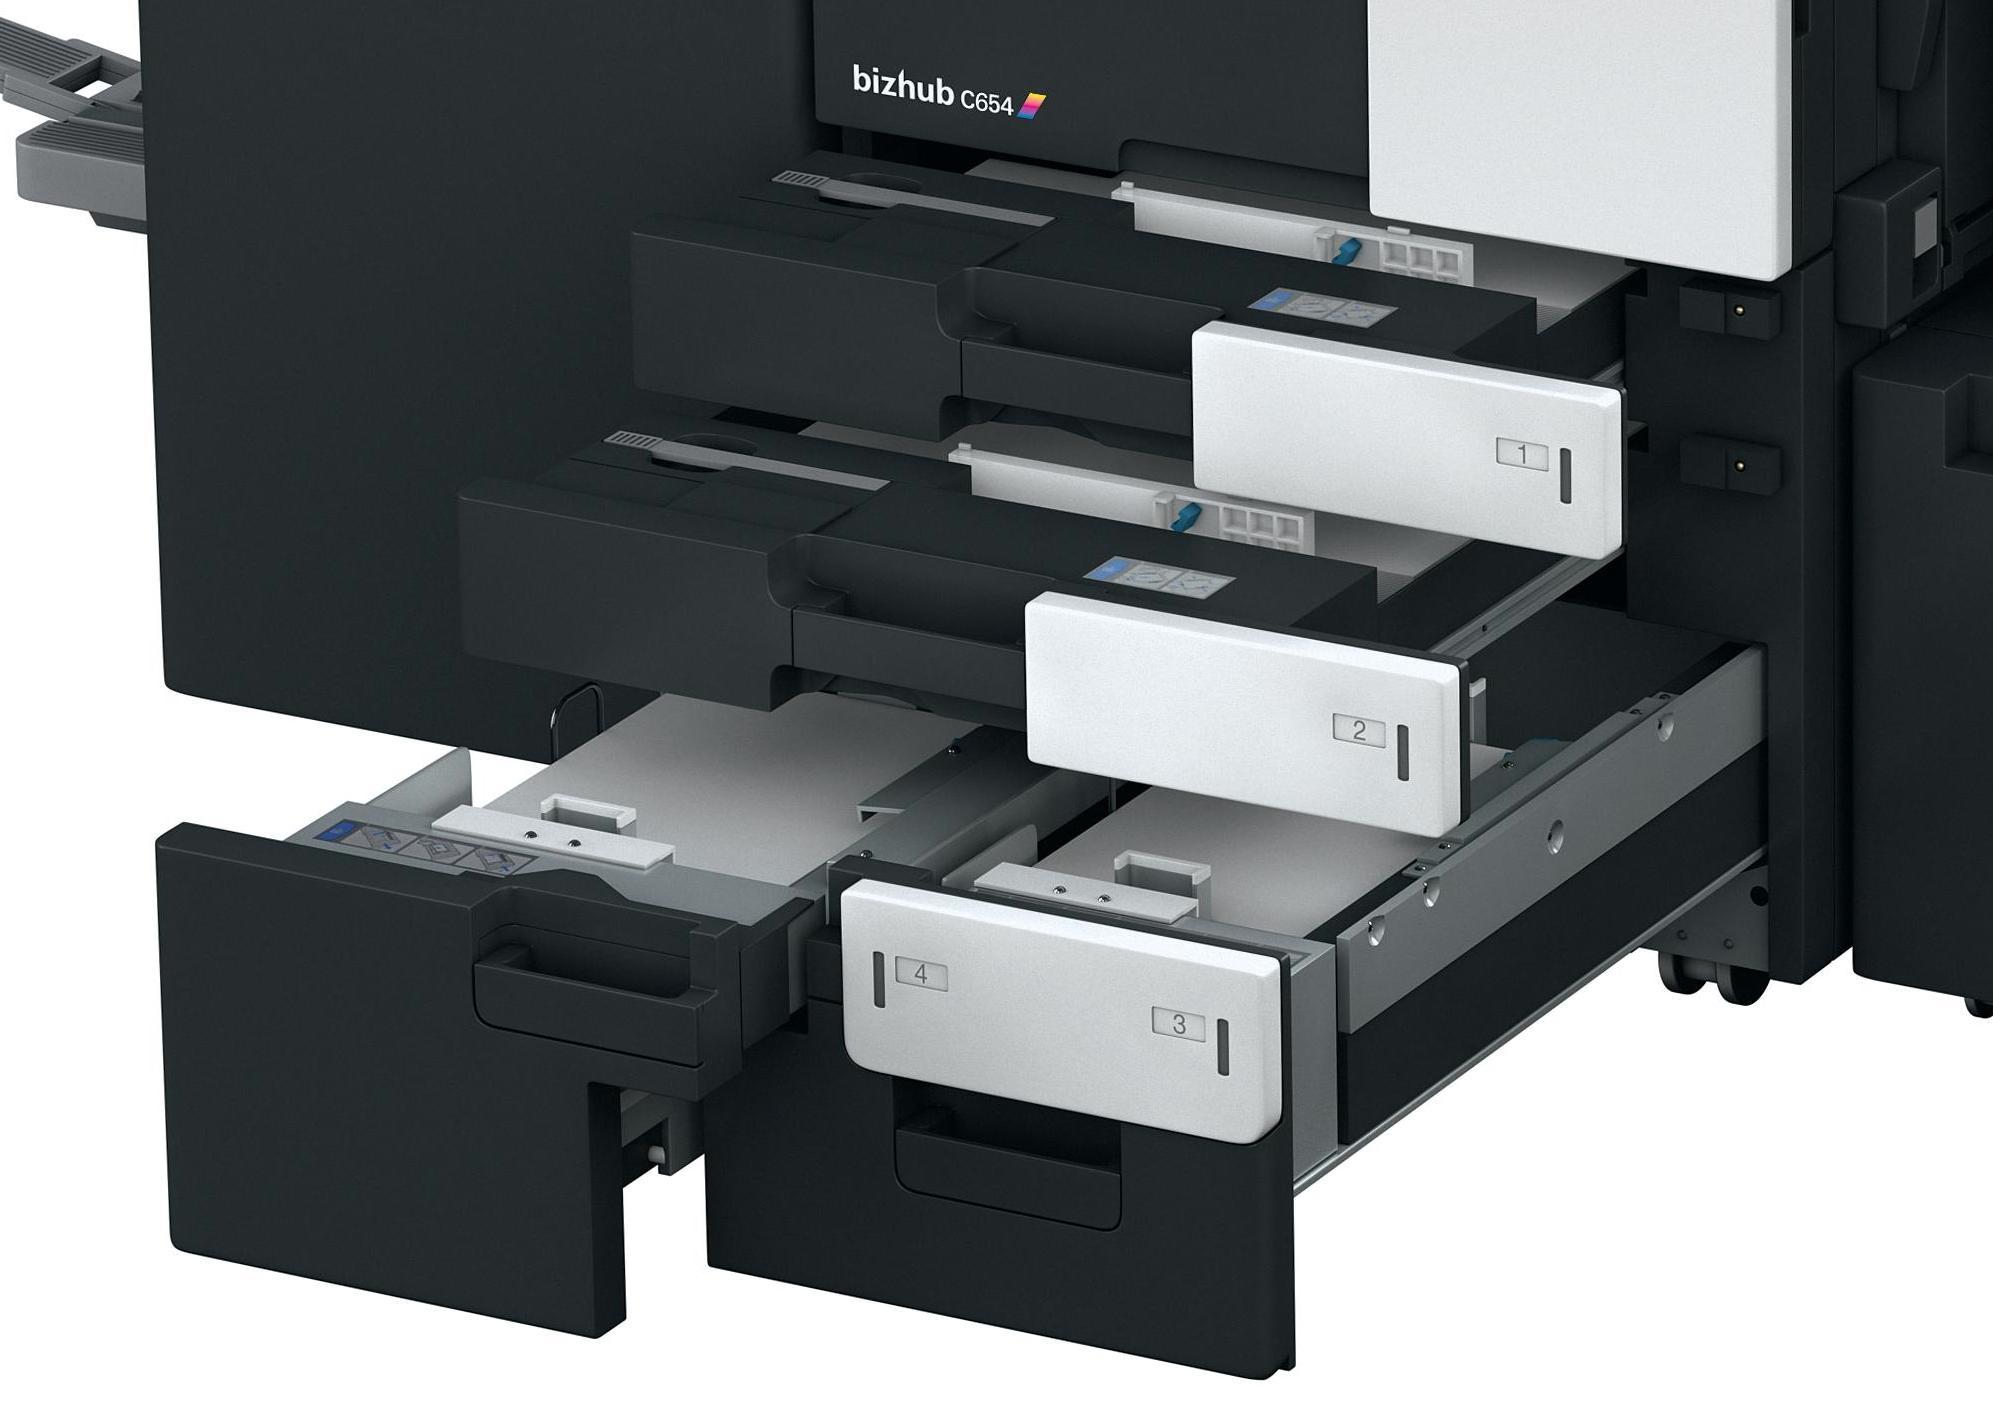 Konica Minolta Bizhub C654 Color Copier / Printer / Scanner